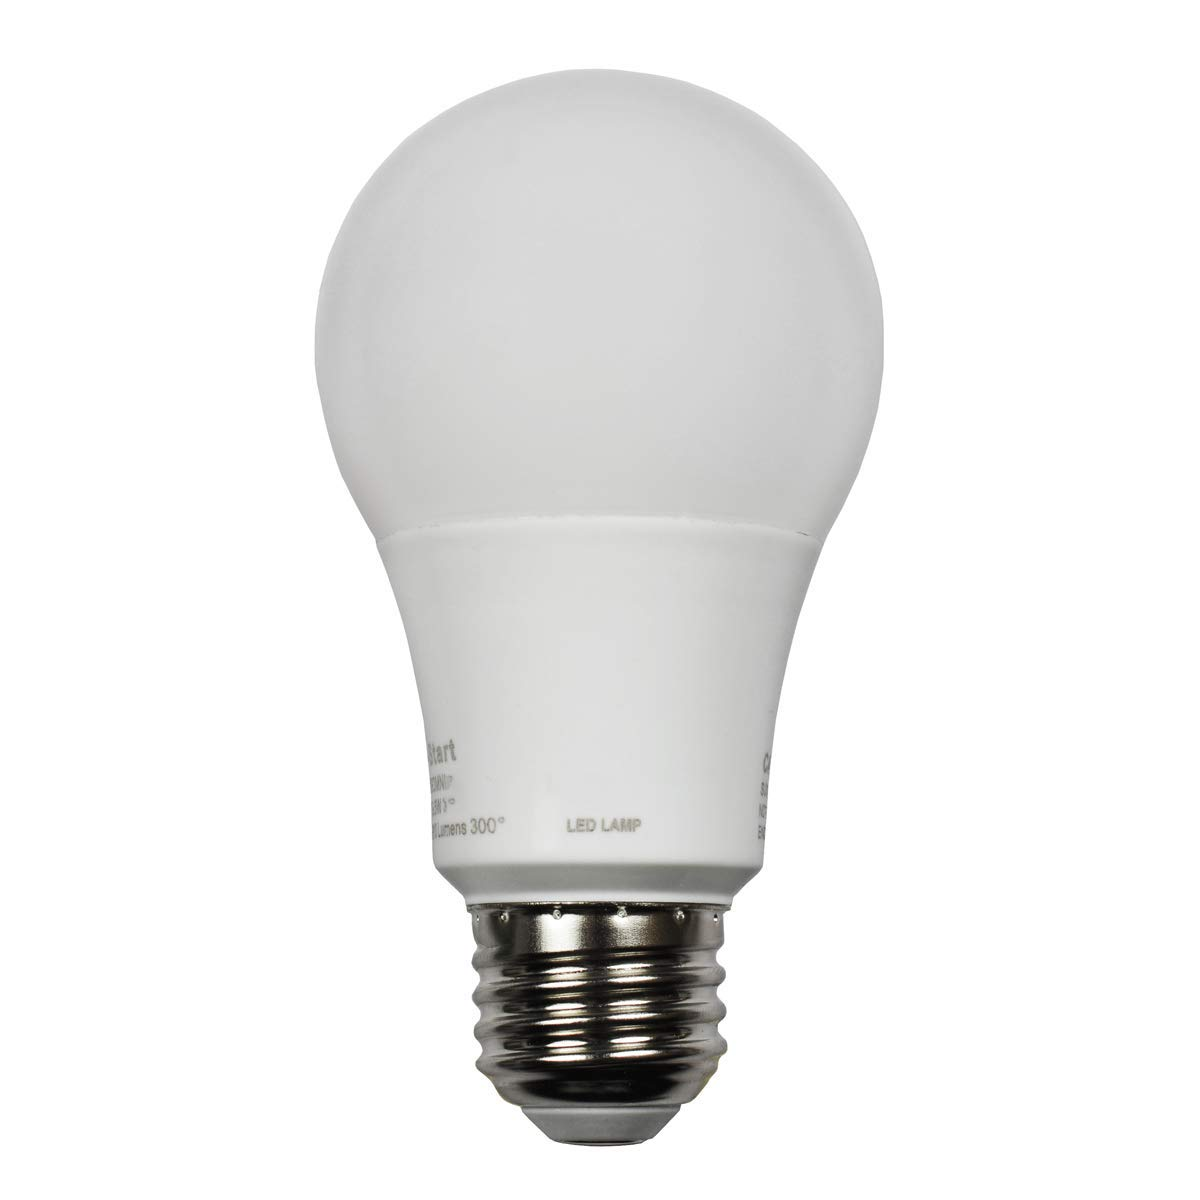 LED-A19OM-UV-4K Cool-White 120-277V - Volts: 120-277V, Watts: 9W, Type: LED A19